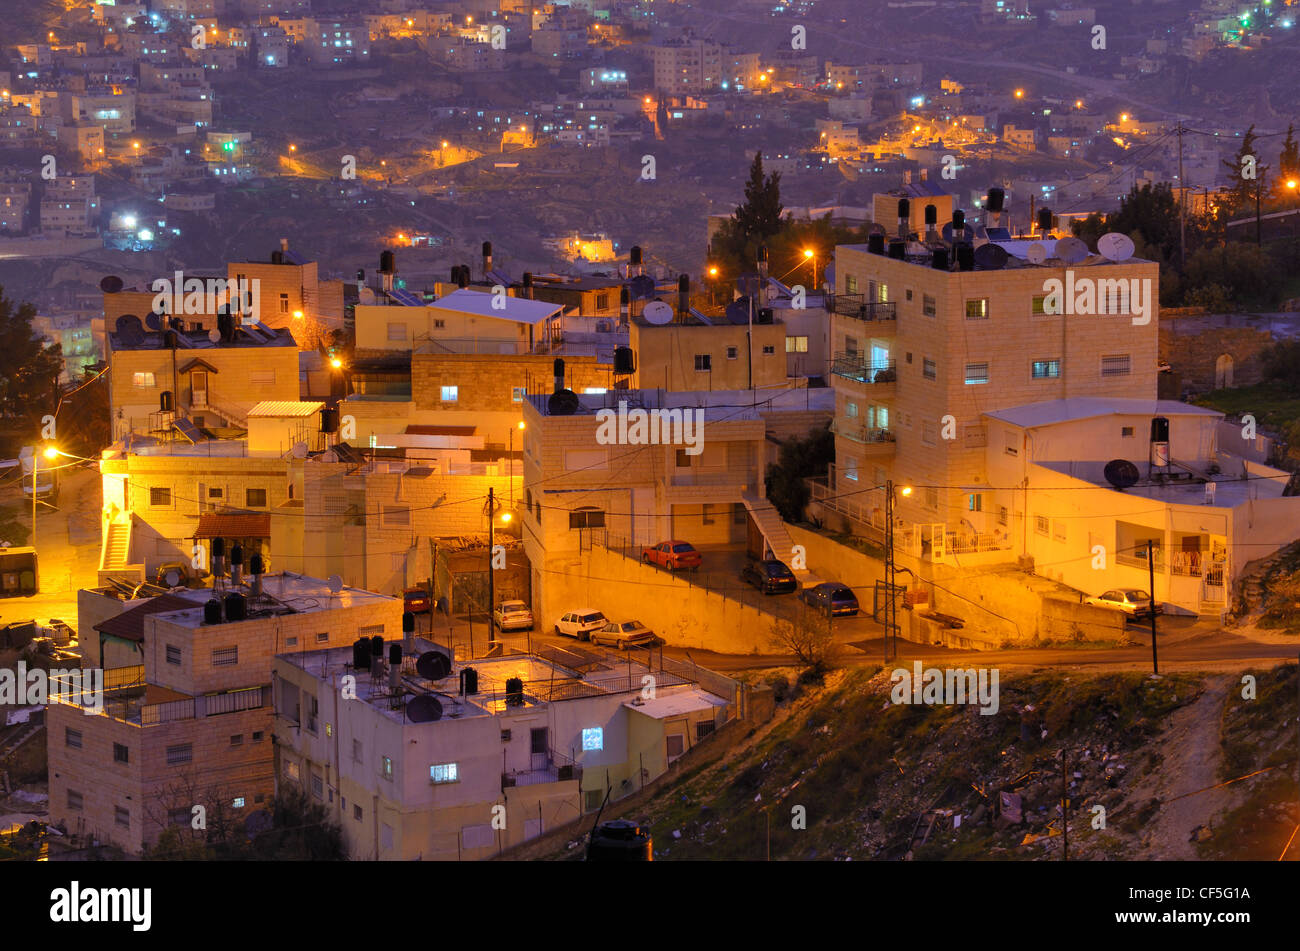 Aldea árabe en Jerusalén, Israel. Imagen De Stock